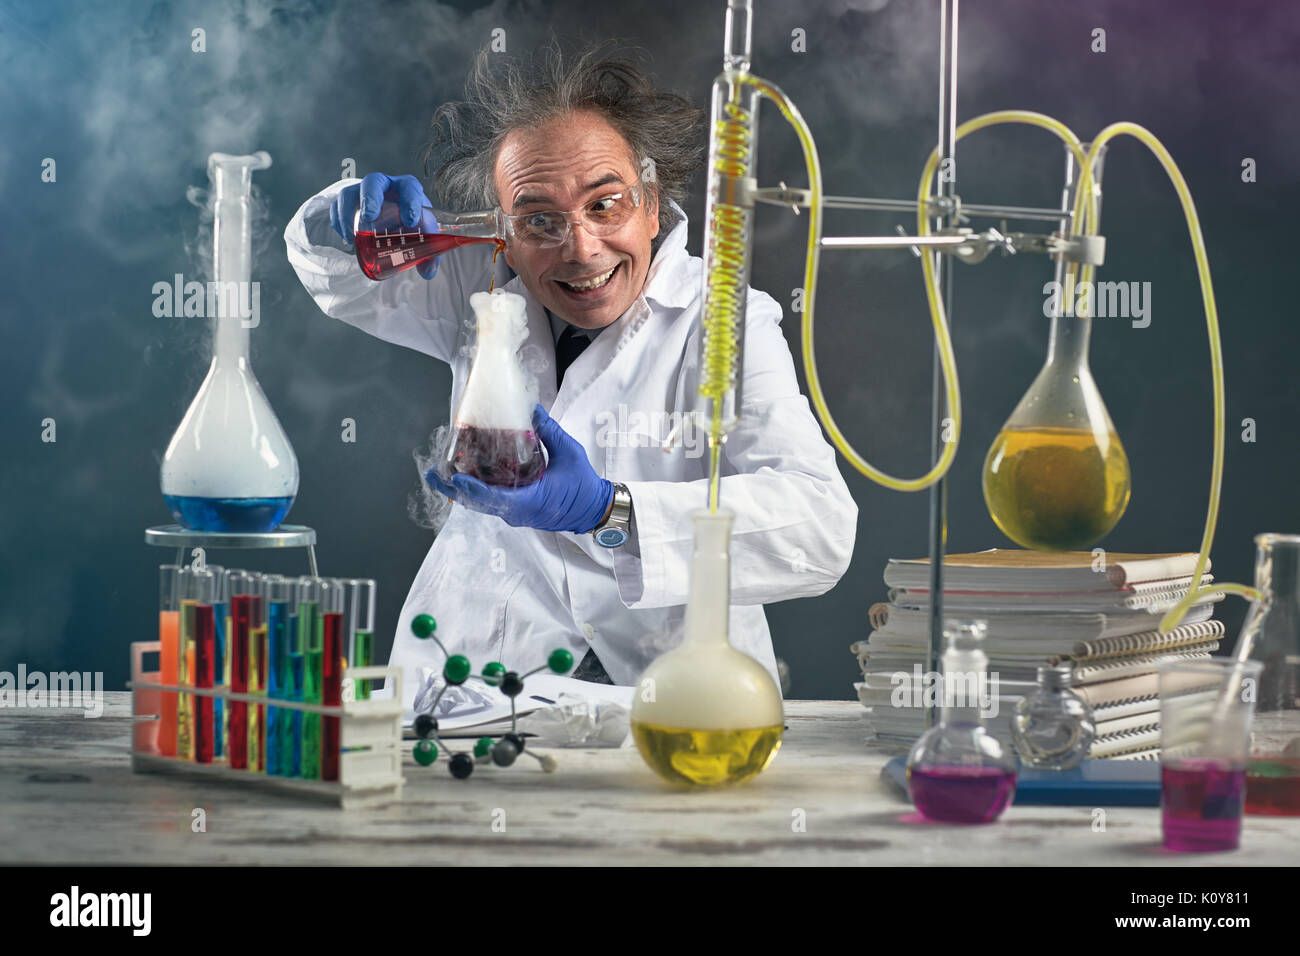 crazy-chemist-doing-experiment-chemical-laboratory-K0Y811.jpg